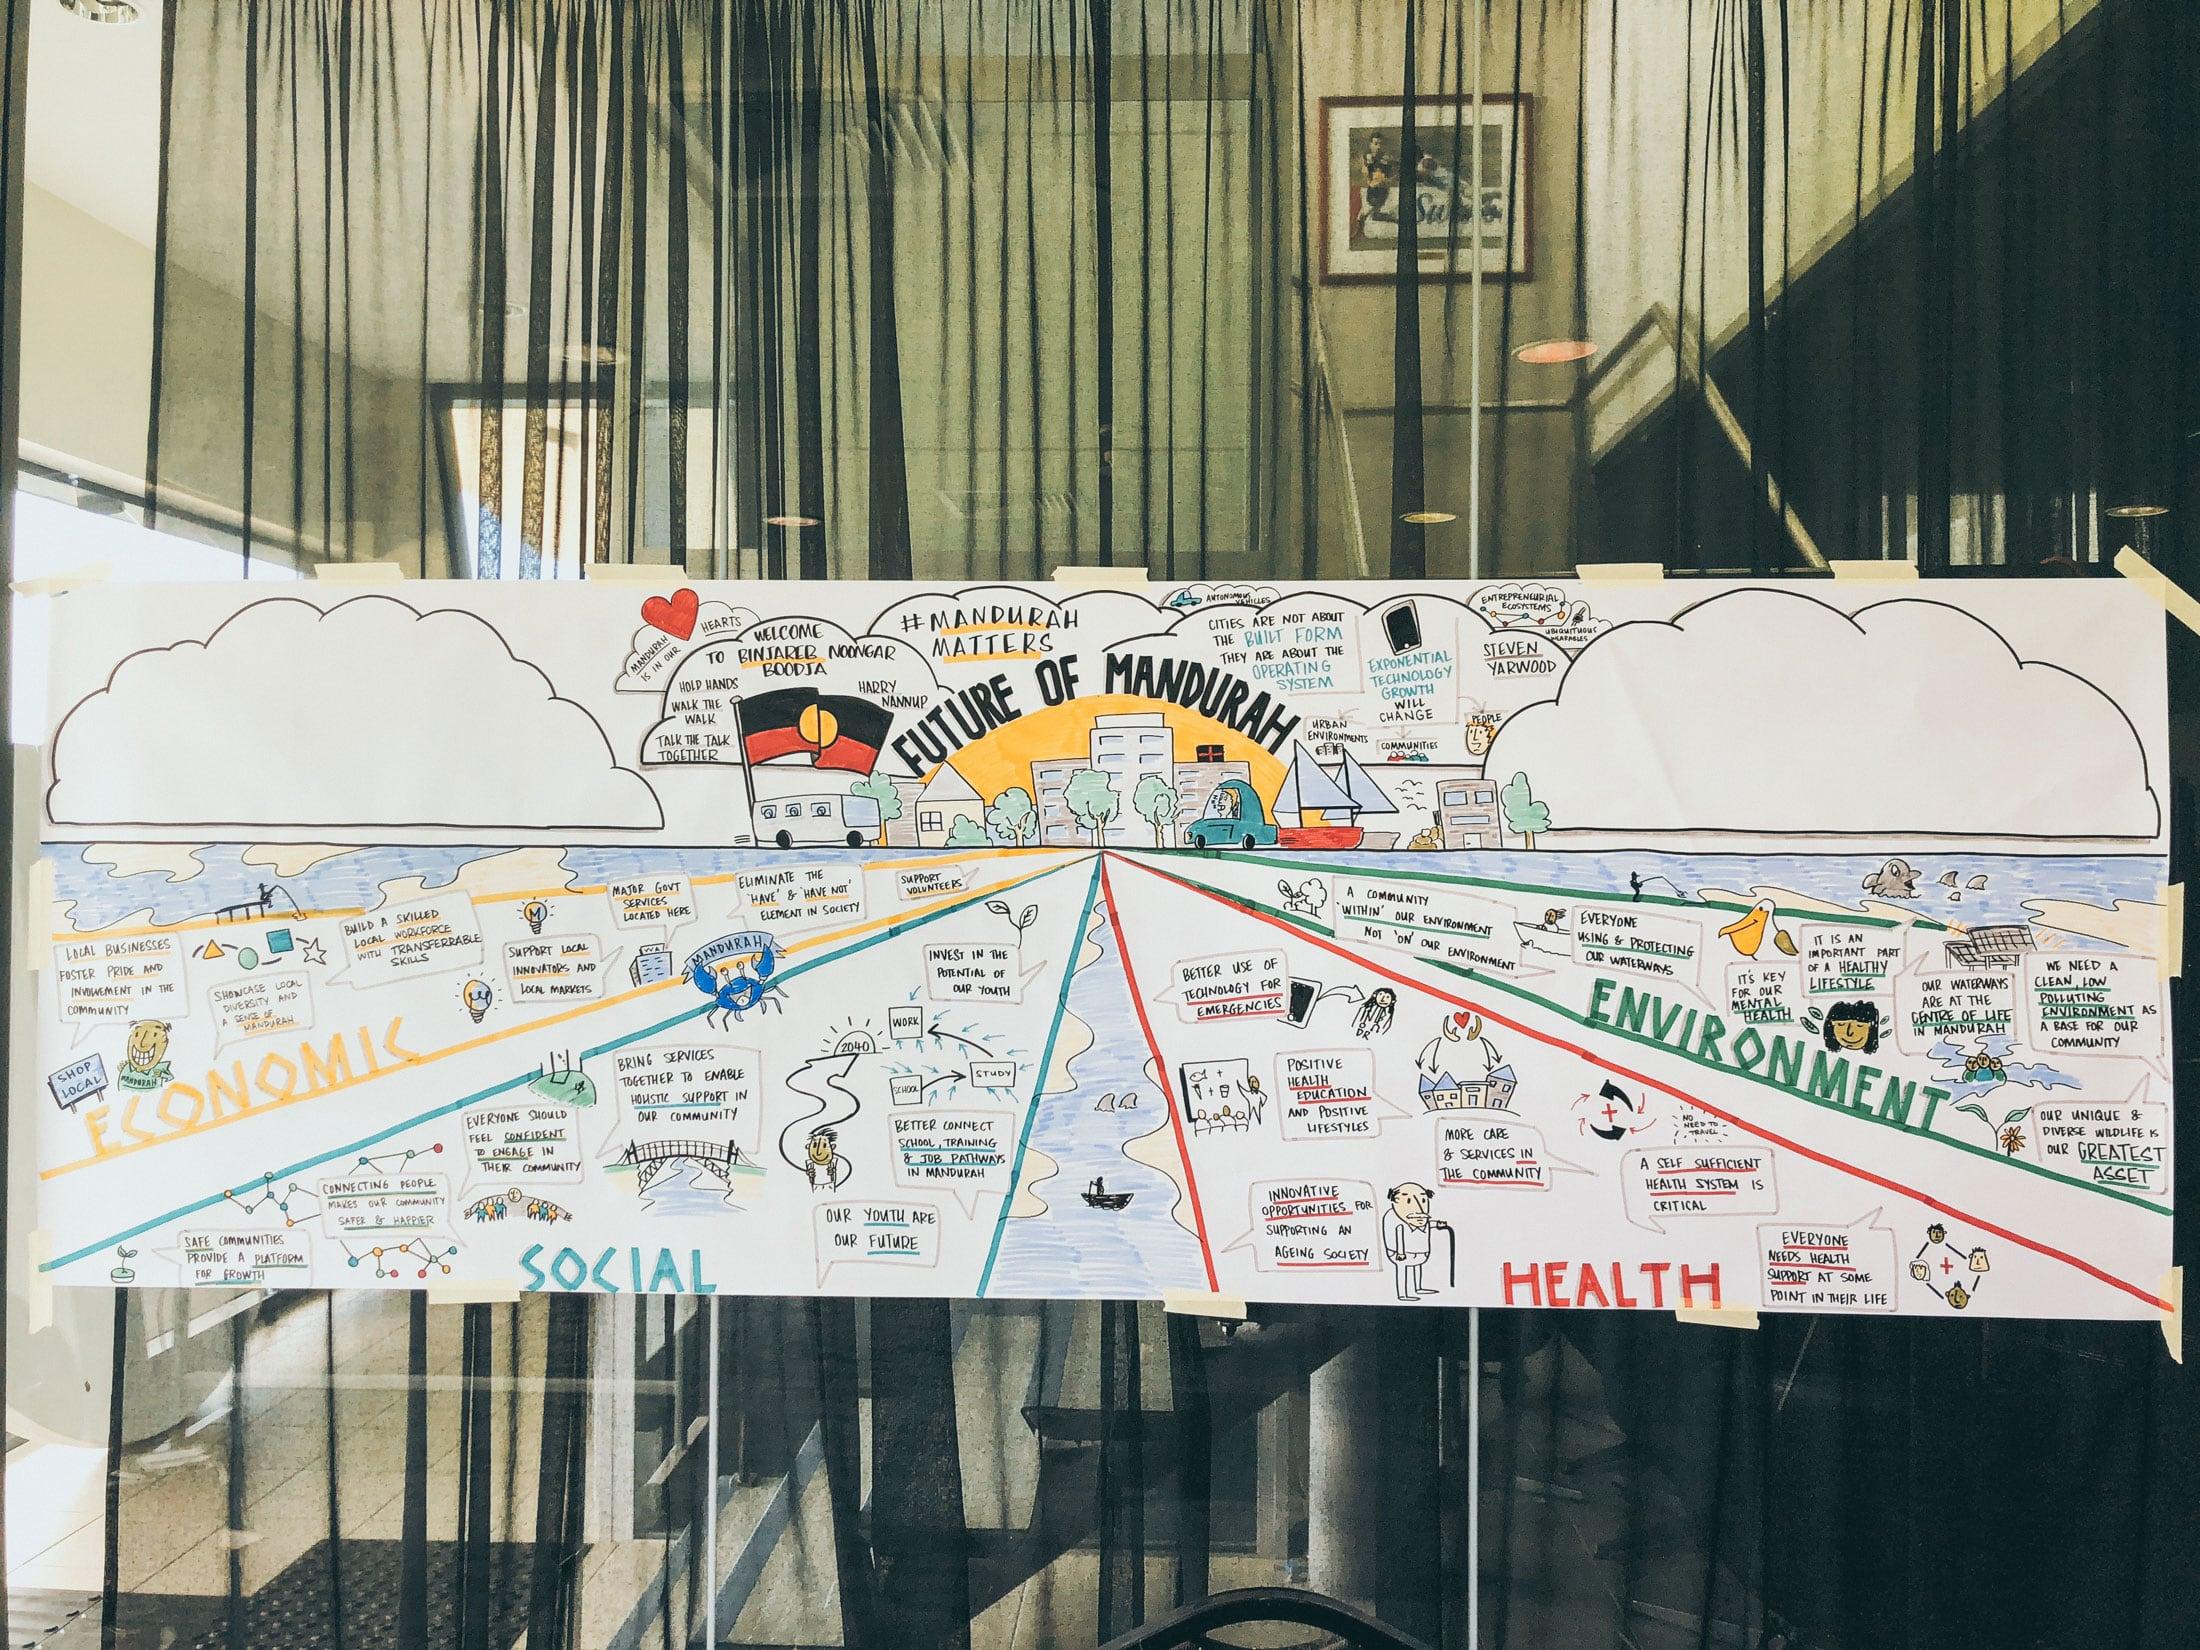 2019-Mandurah-Matters-Summit-(13)_LR.jpg